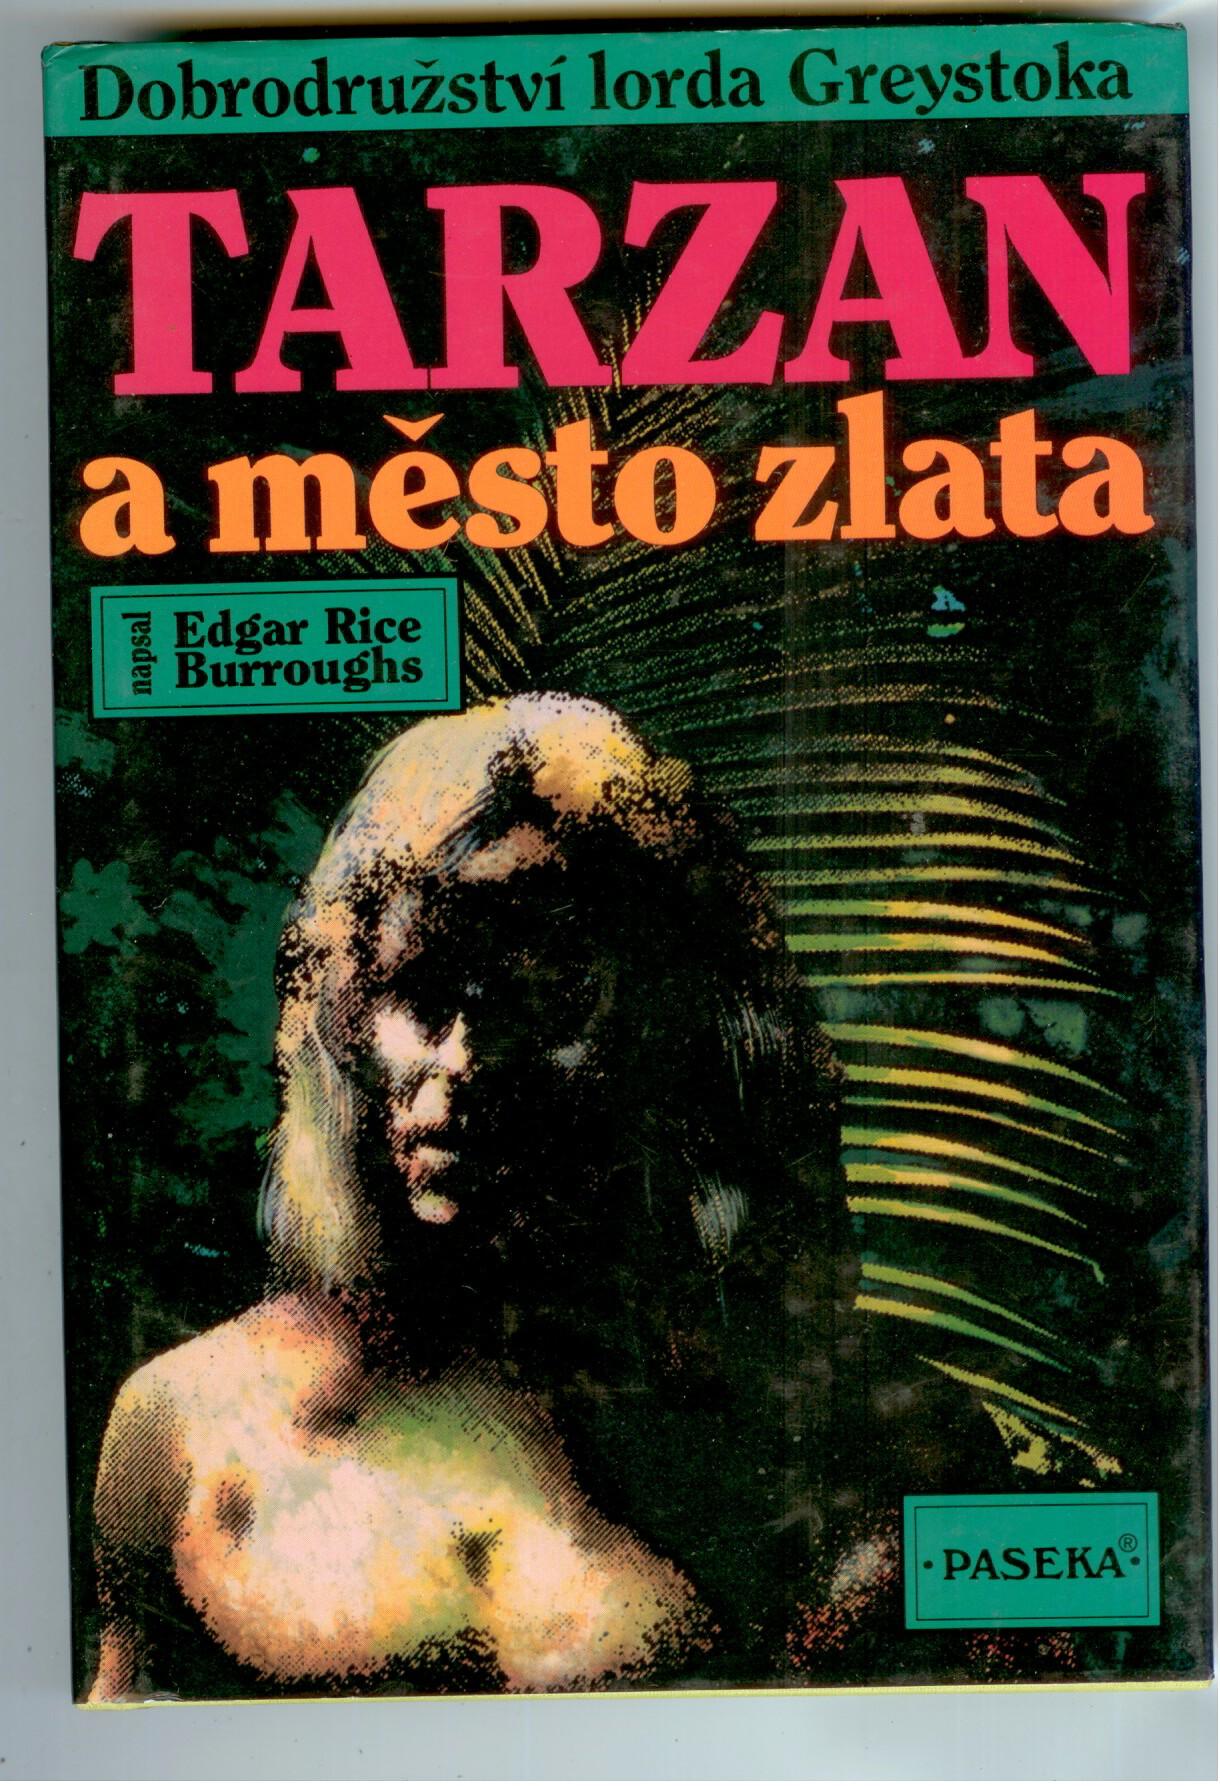 Tarzan a město zlata - Edgar Rice Burroughs